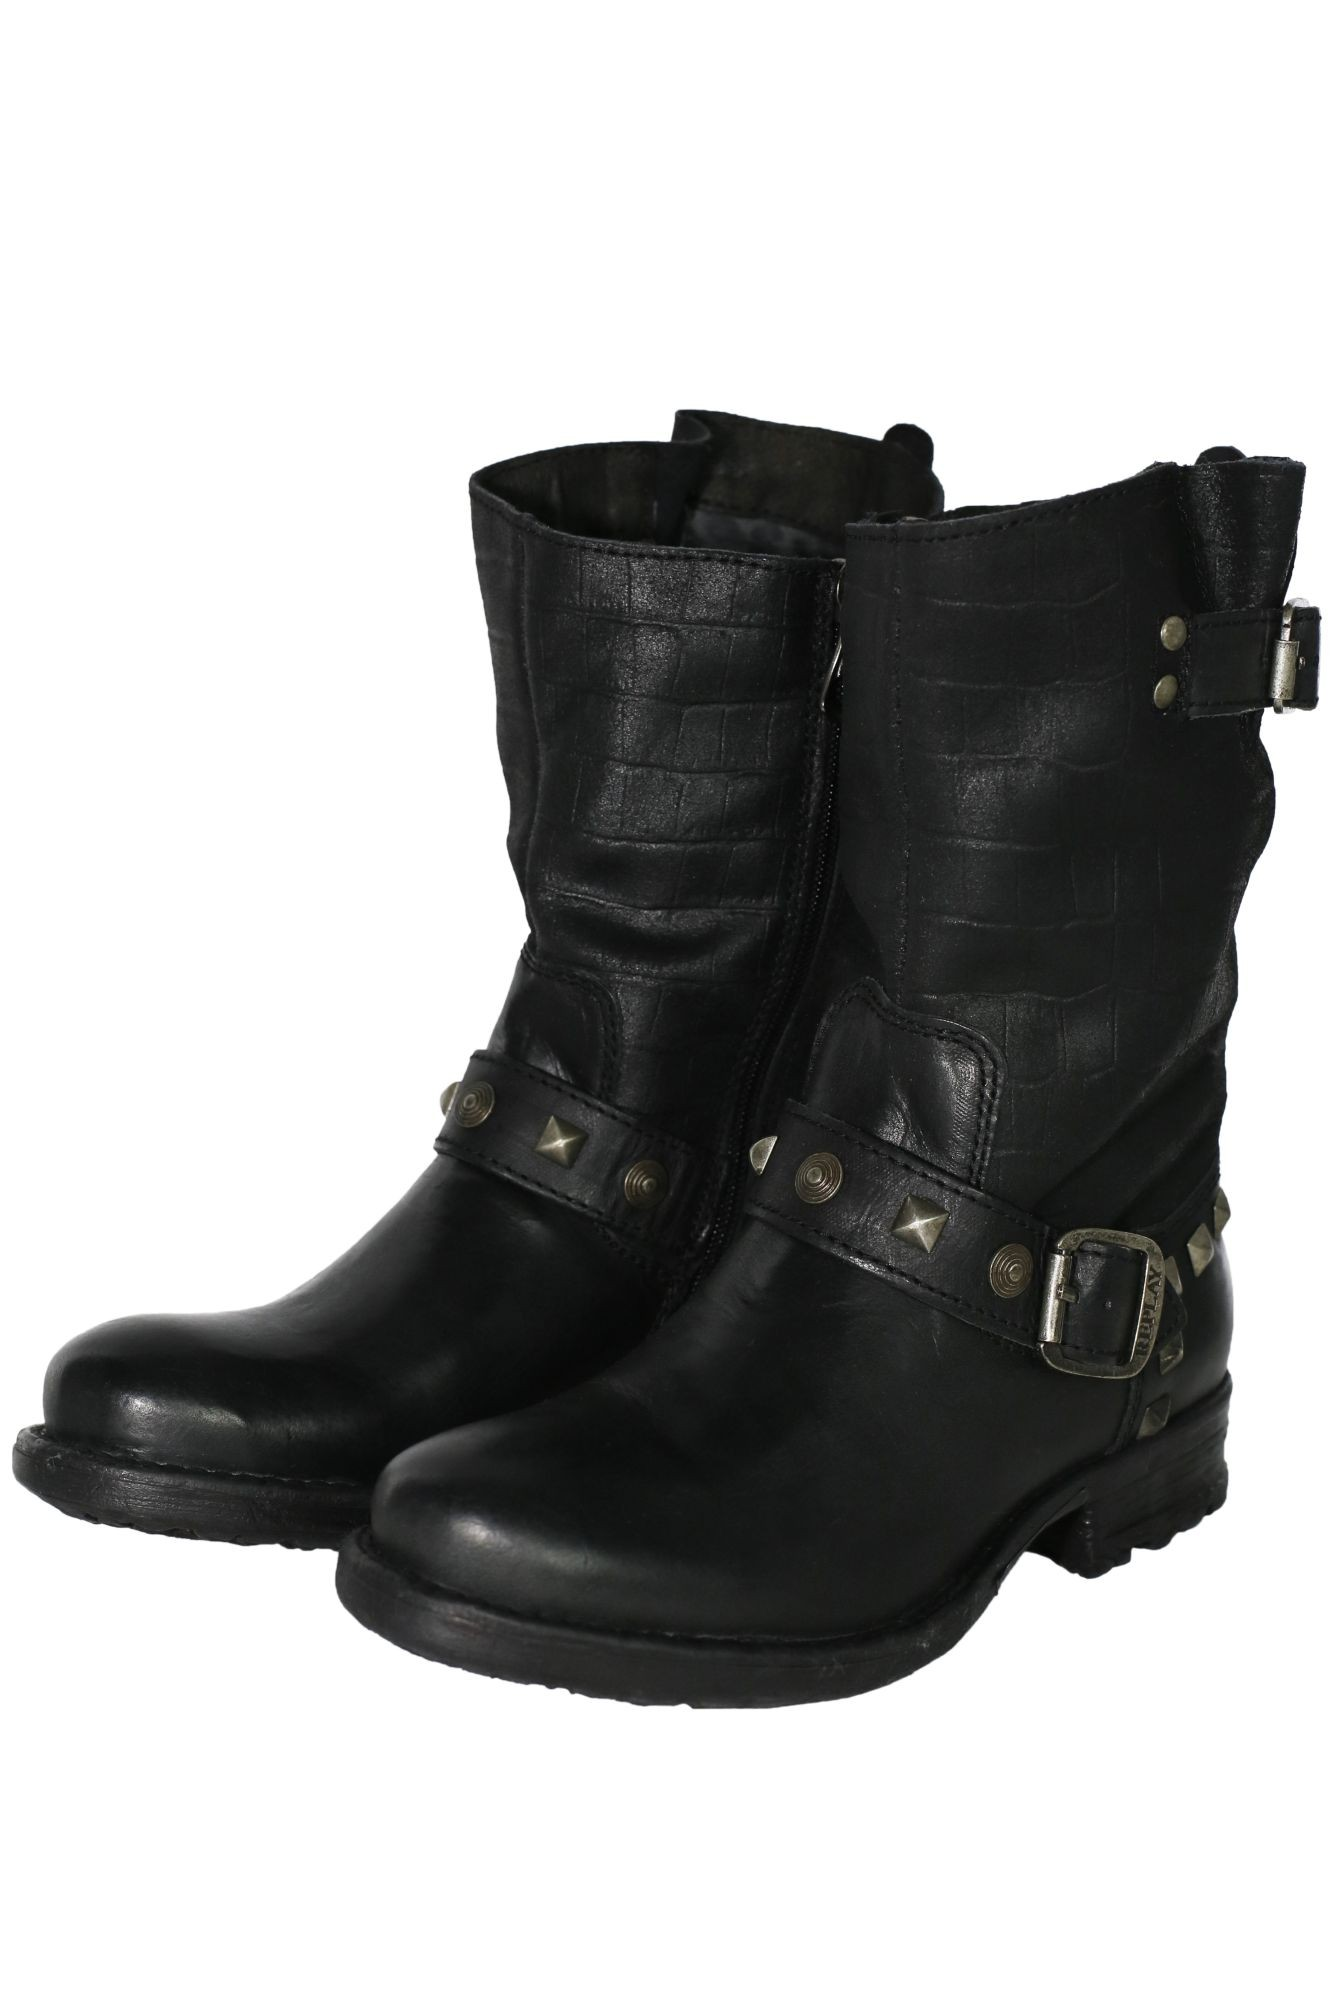 replay avery stiefel stiefeletten biker boots damen leder ebay. Black Bedroom Furniture Sets. Home Design Ideas